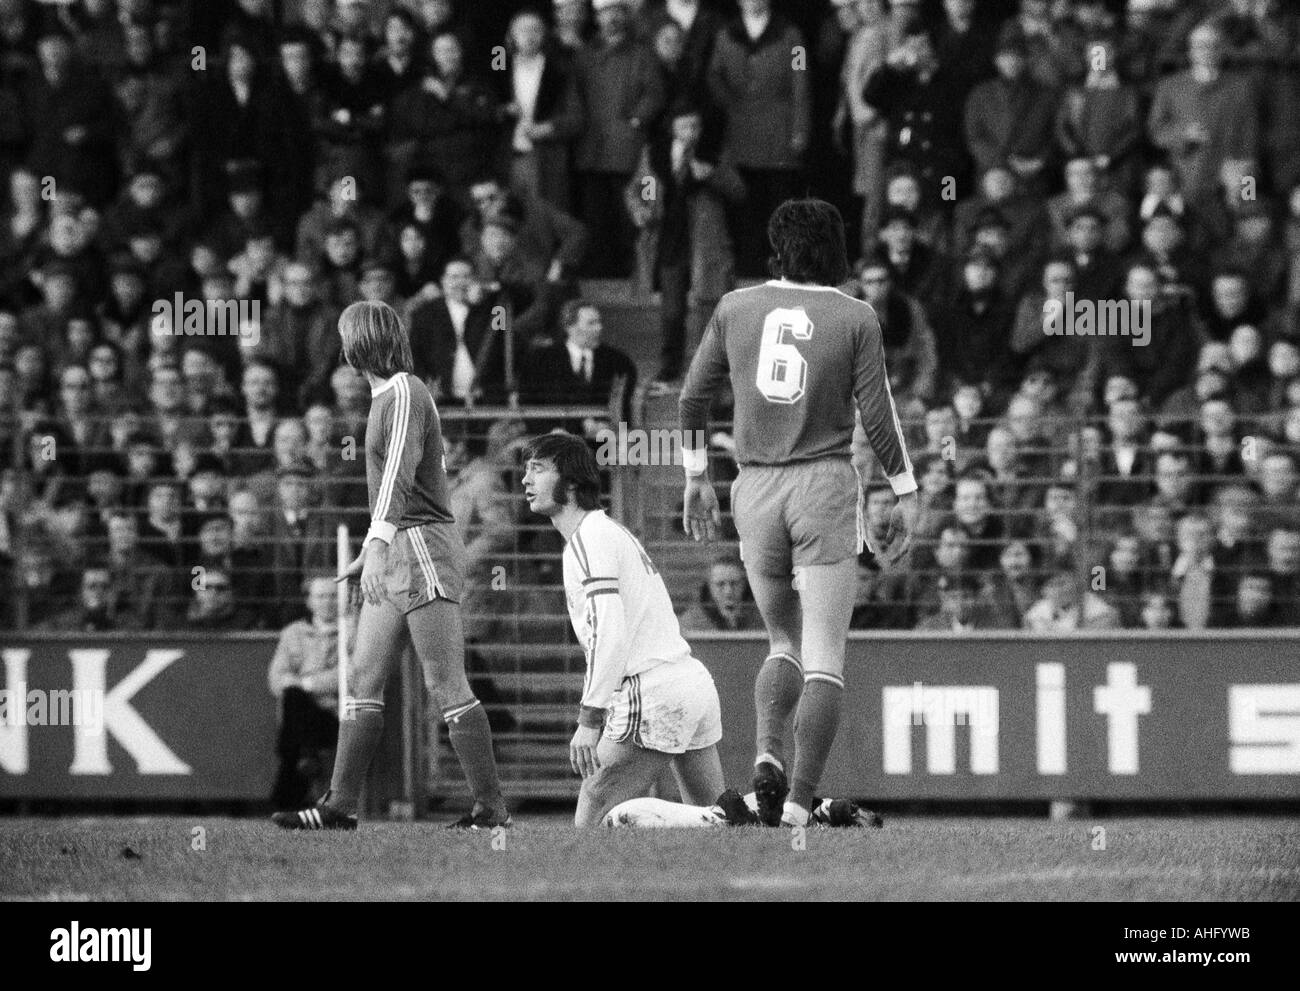 football, Bundesliga, 1973/1974, VfL Bochum versus FC Schalke 04 2:5, Stadium at the Castroper Strasse in Bochum, scene of the match, Hans Walitza (Bochum) kneels - Stock Image